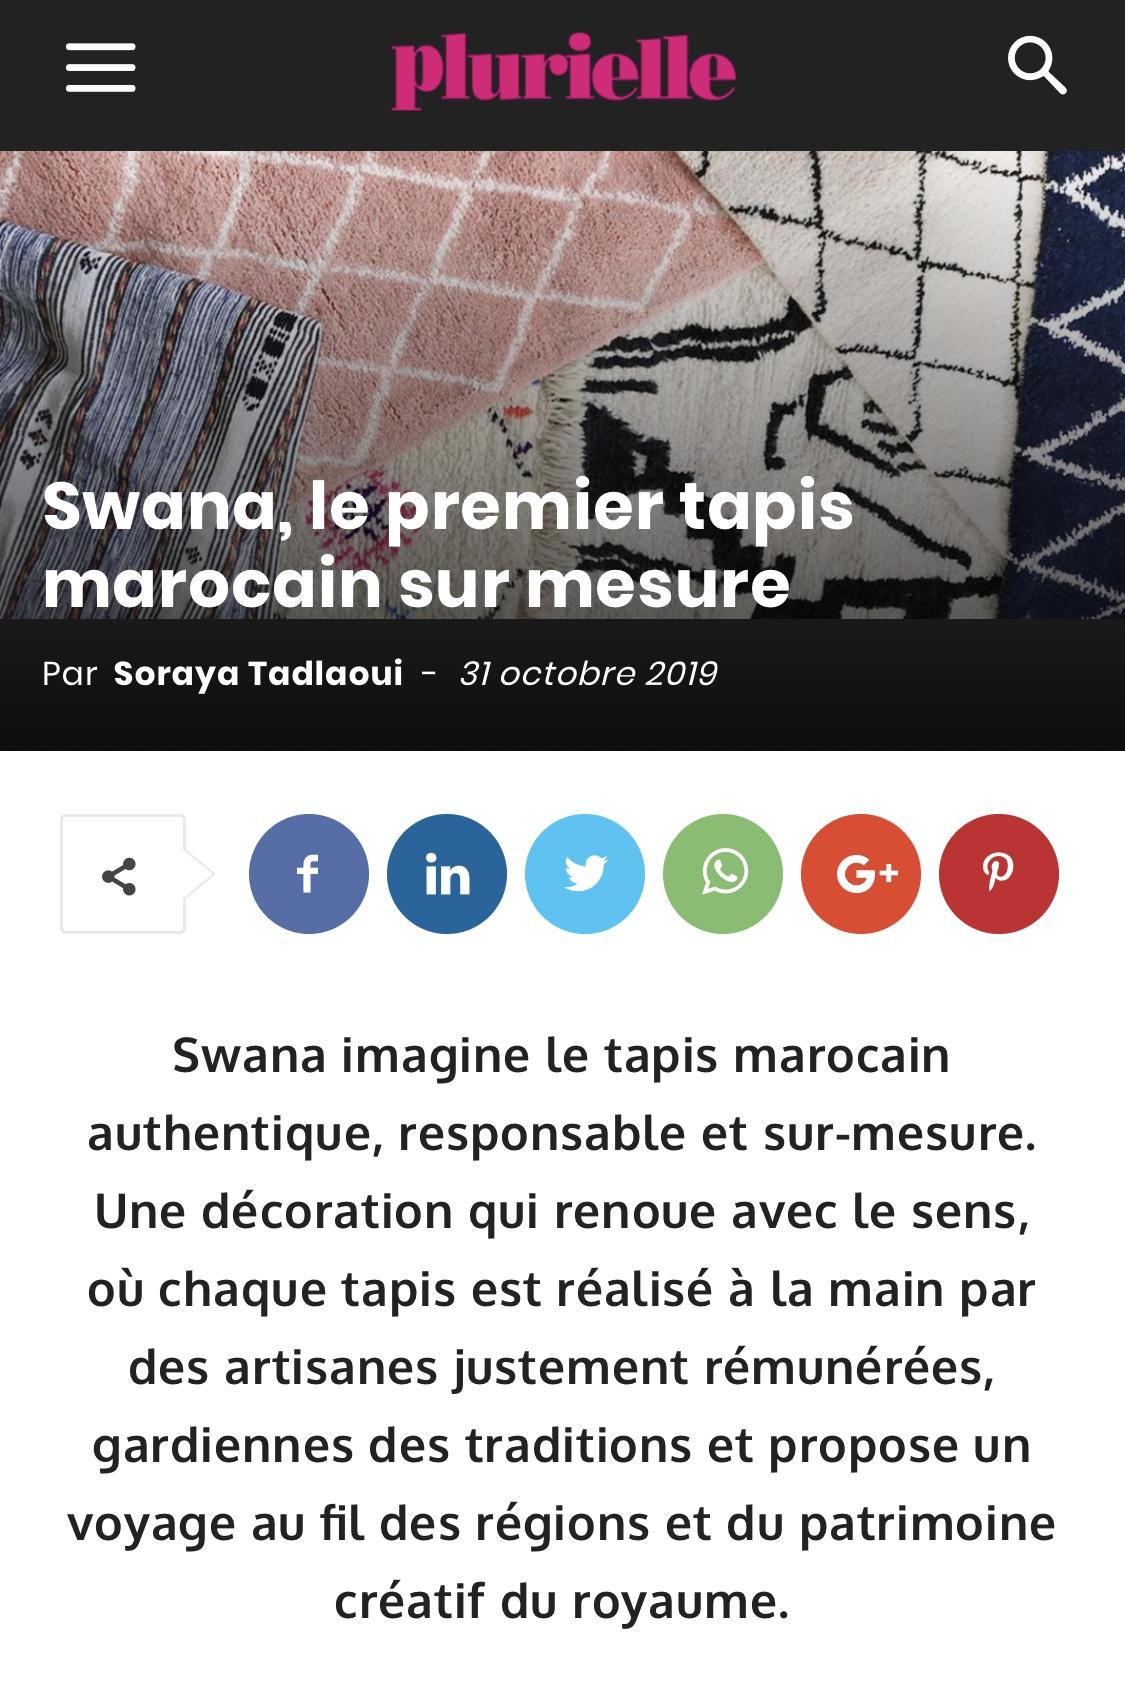 Plurielle Swana Maroc